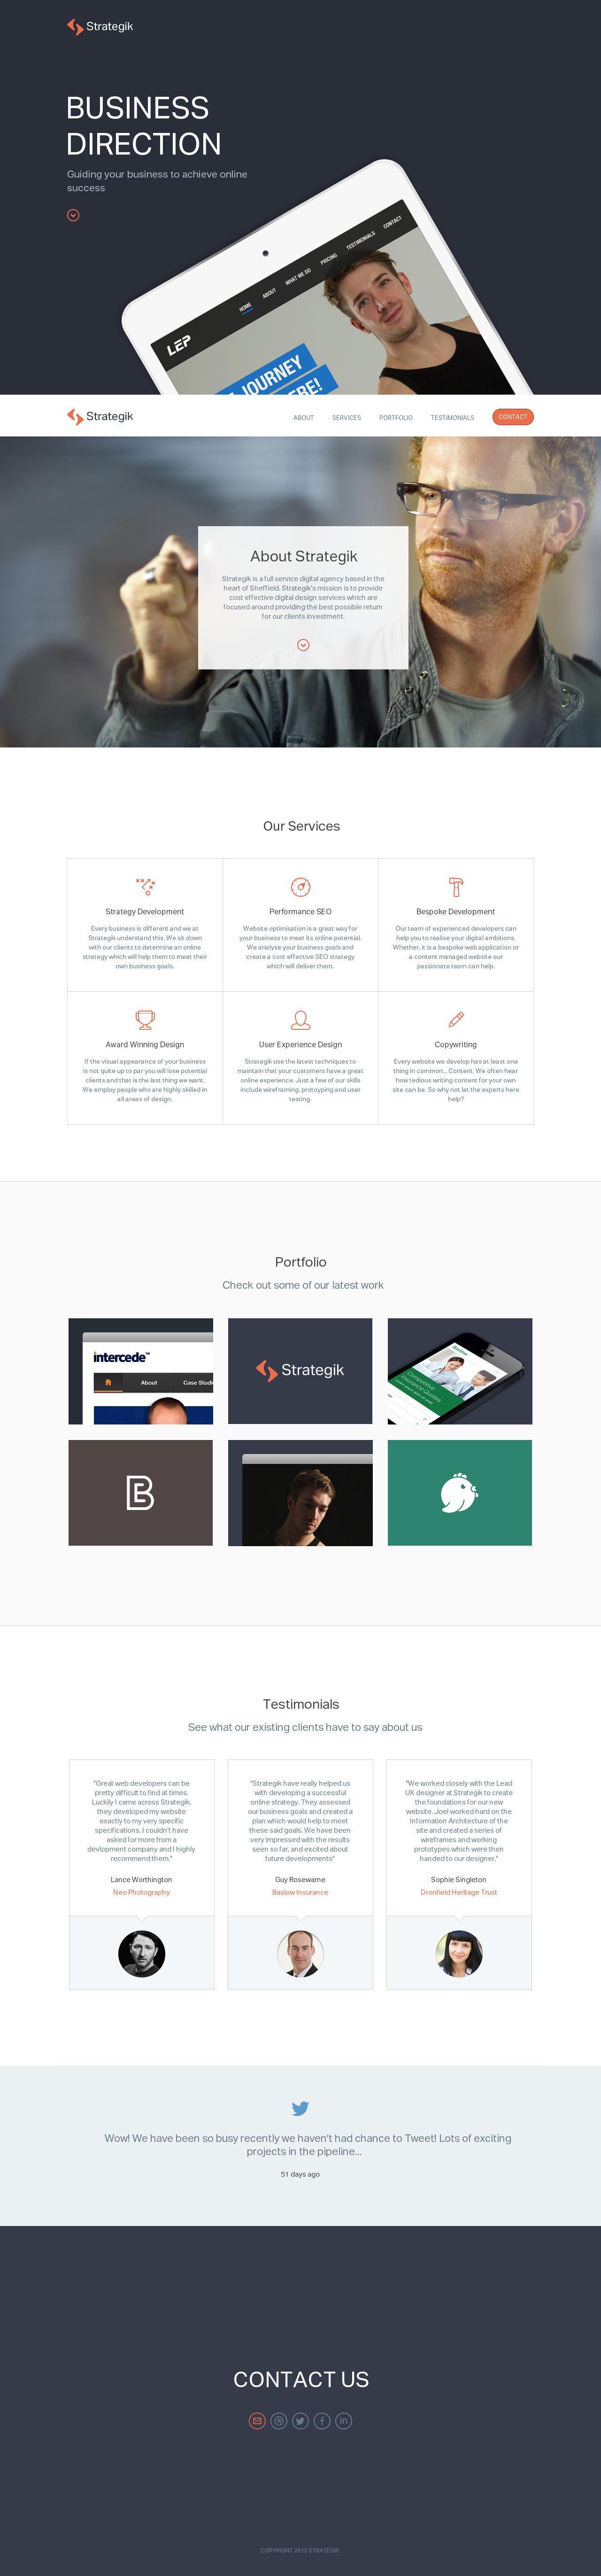 Strategik Webdesign Responsive Interactive Design